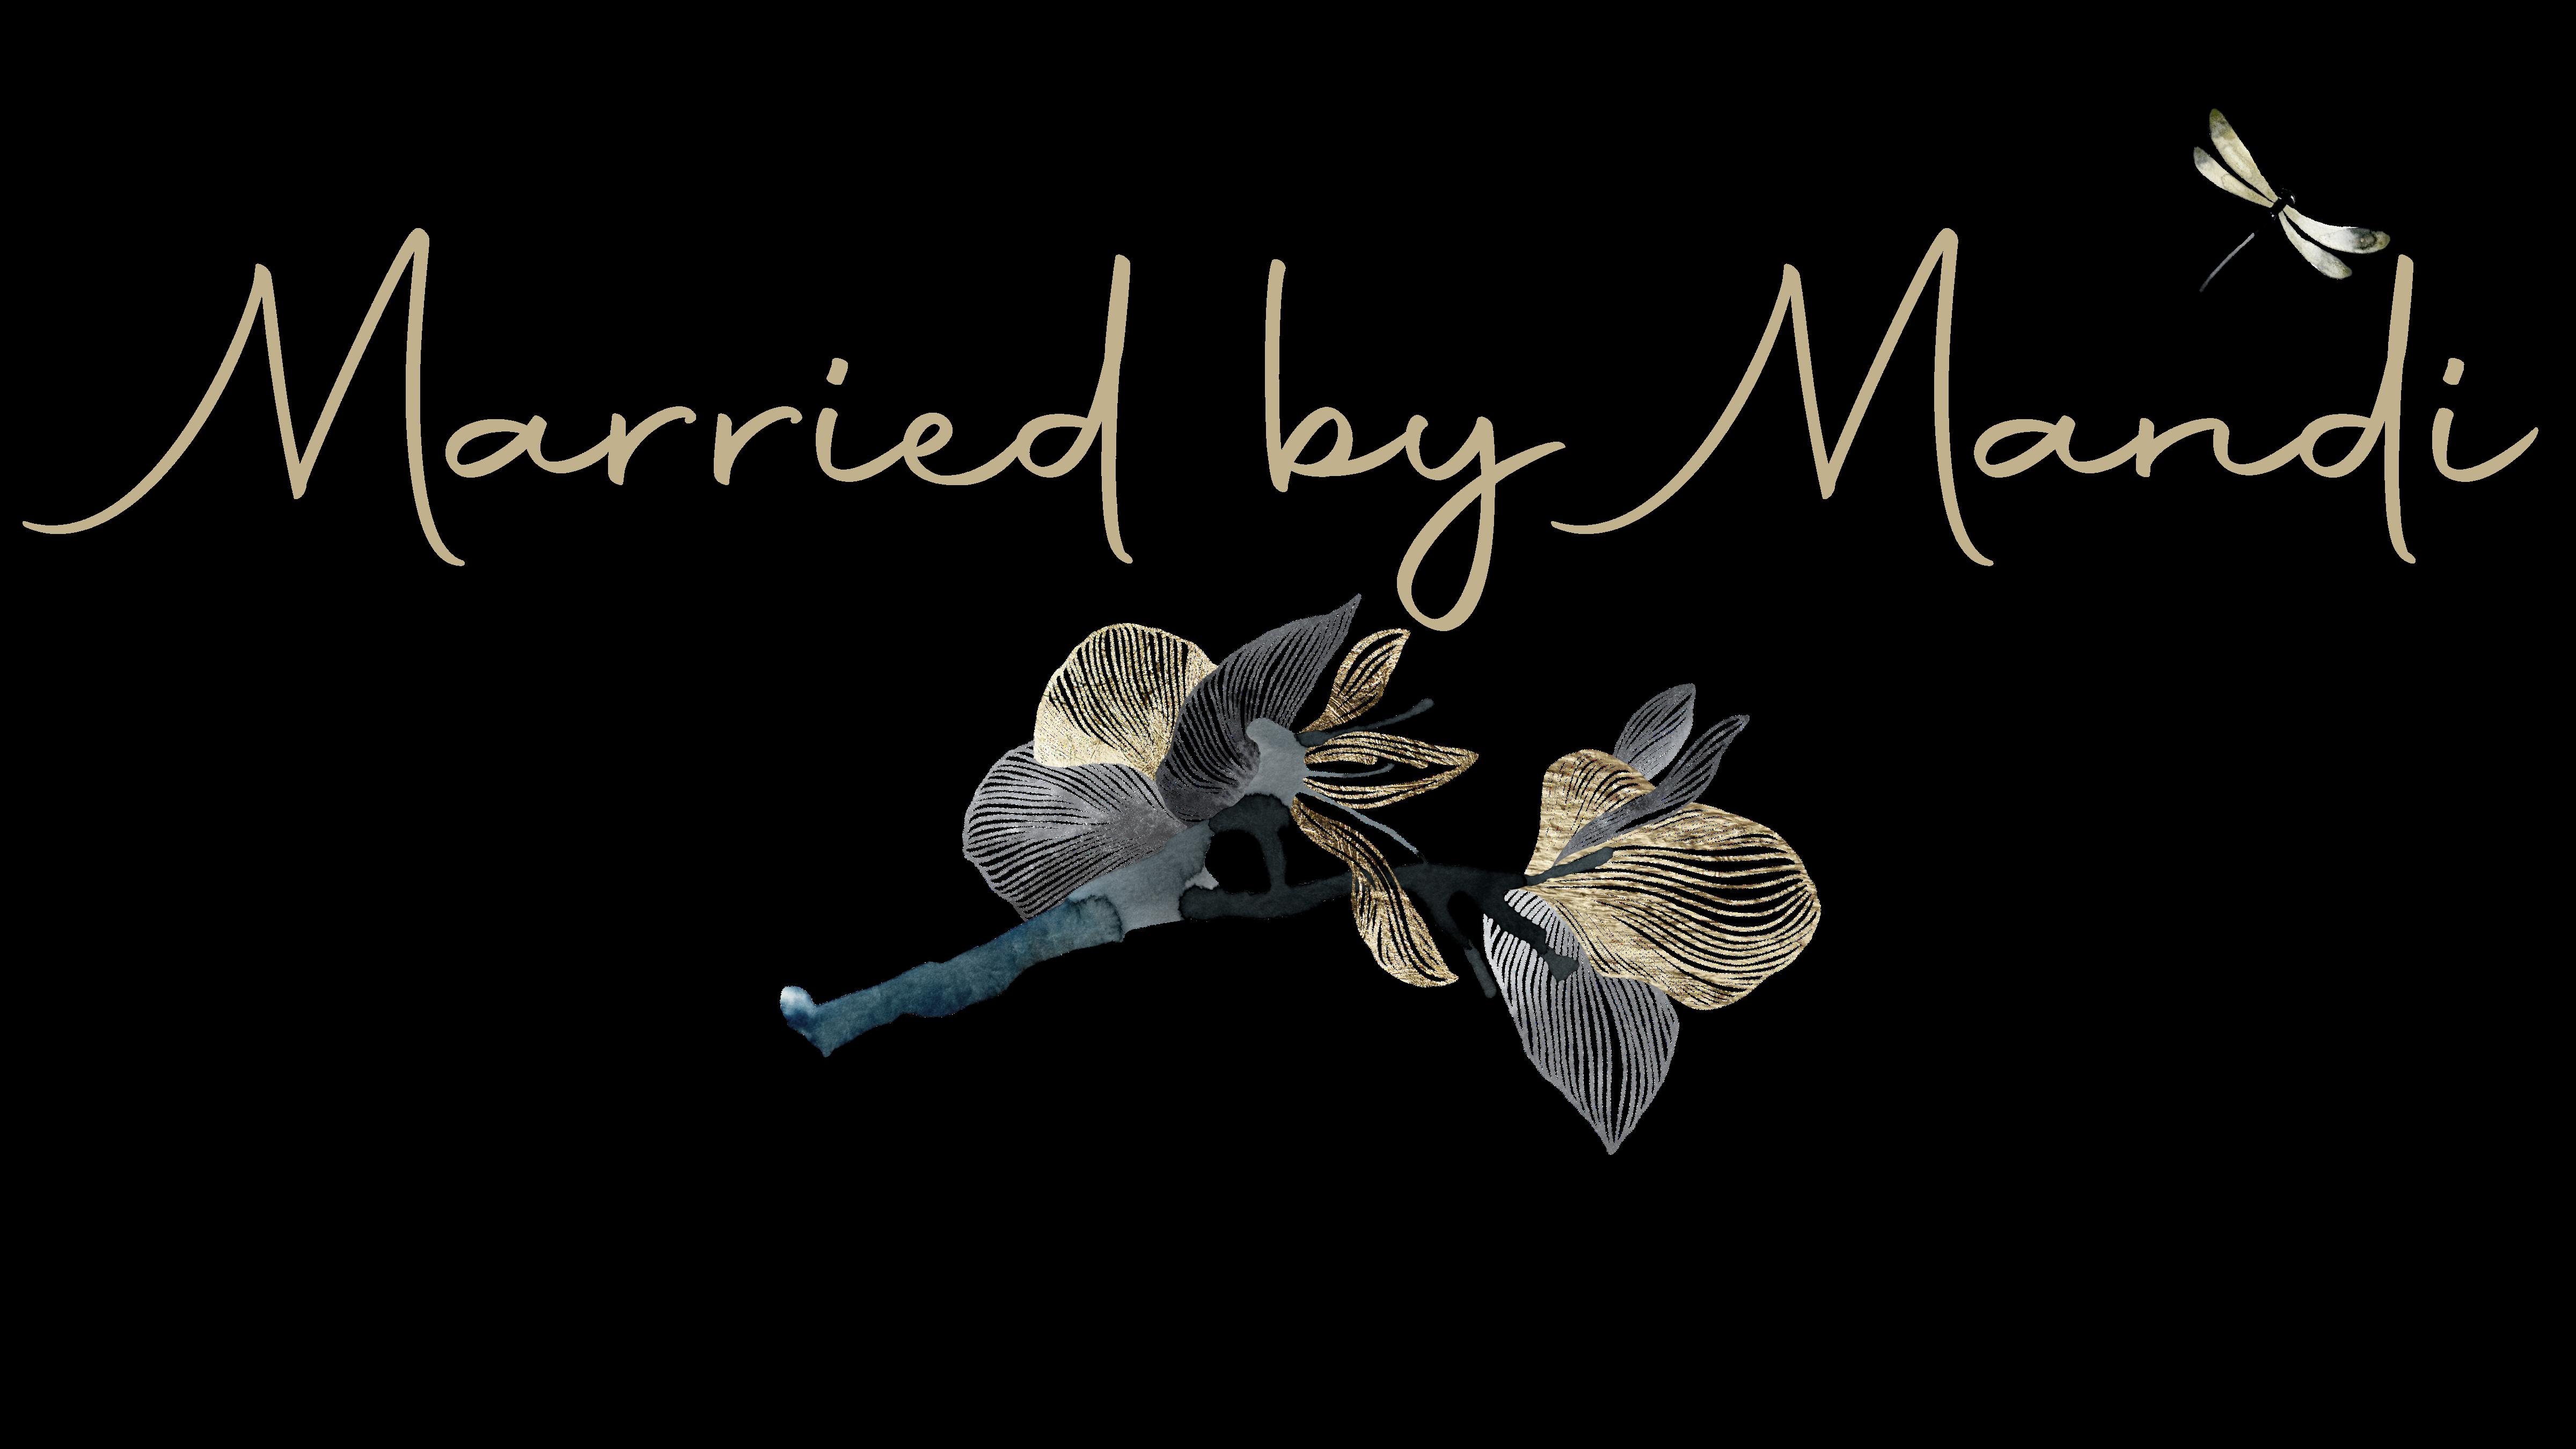 Married by Mandi